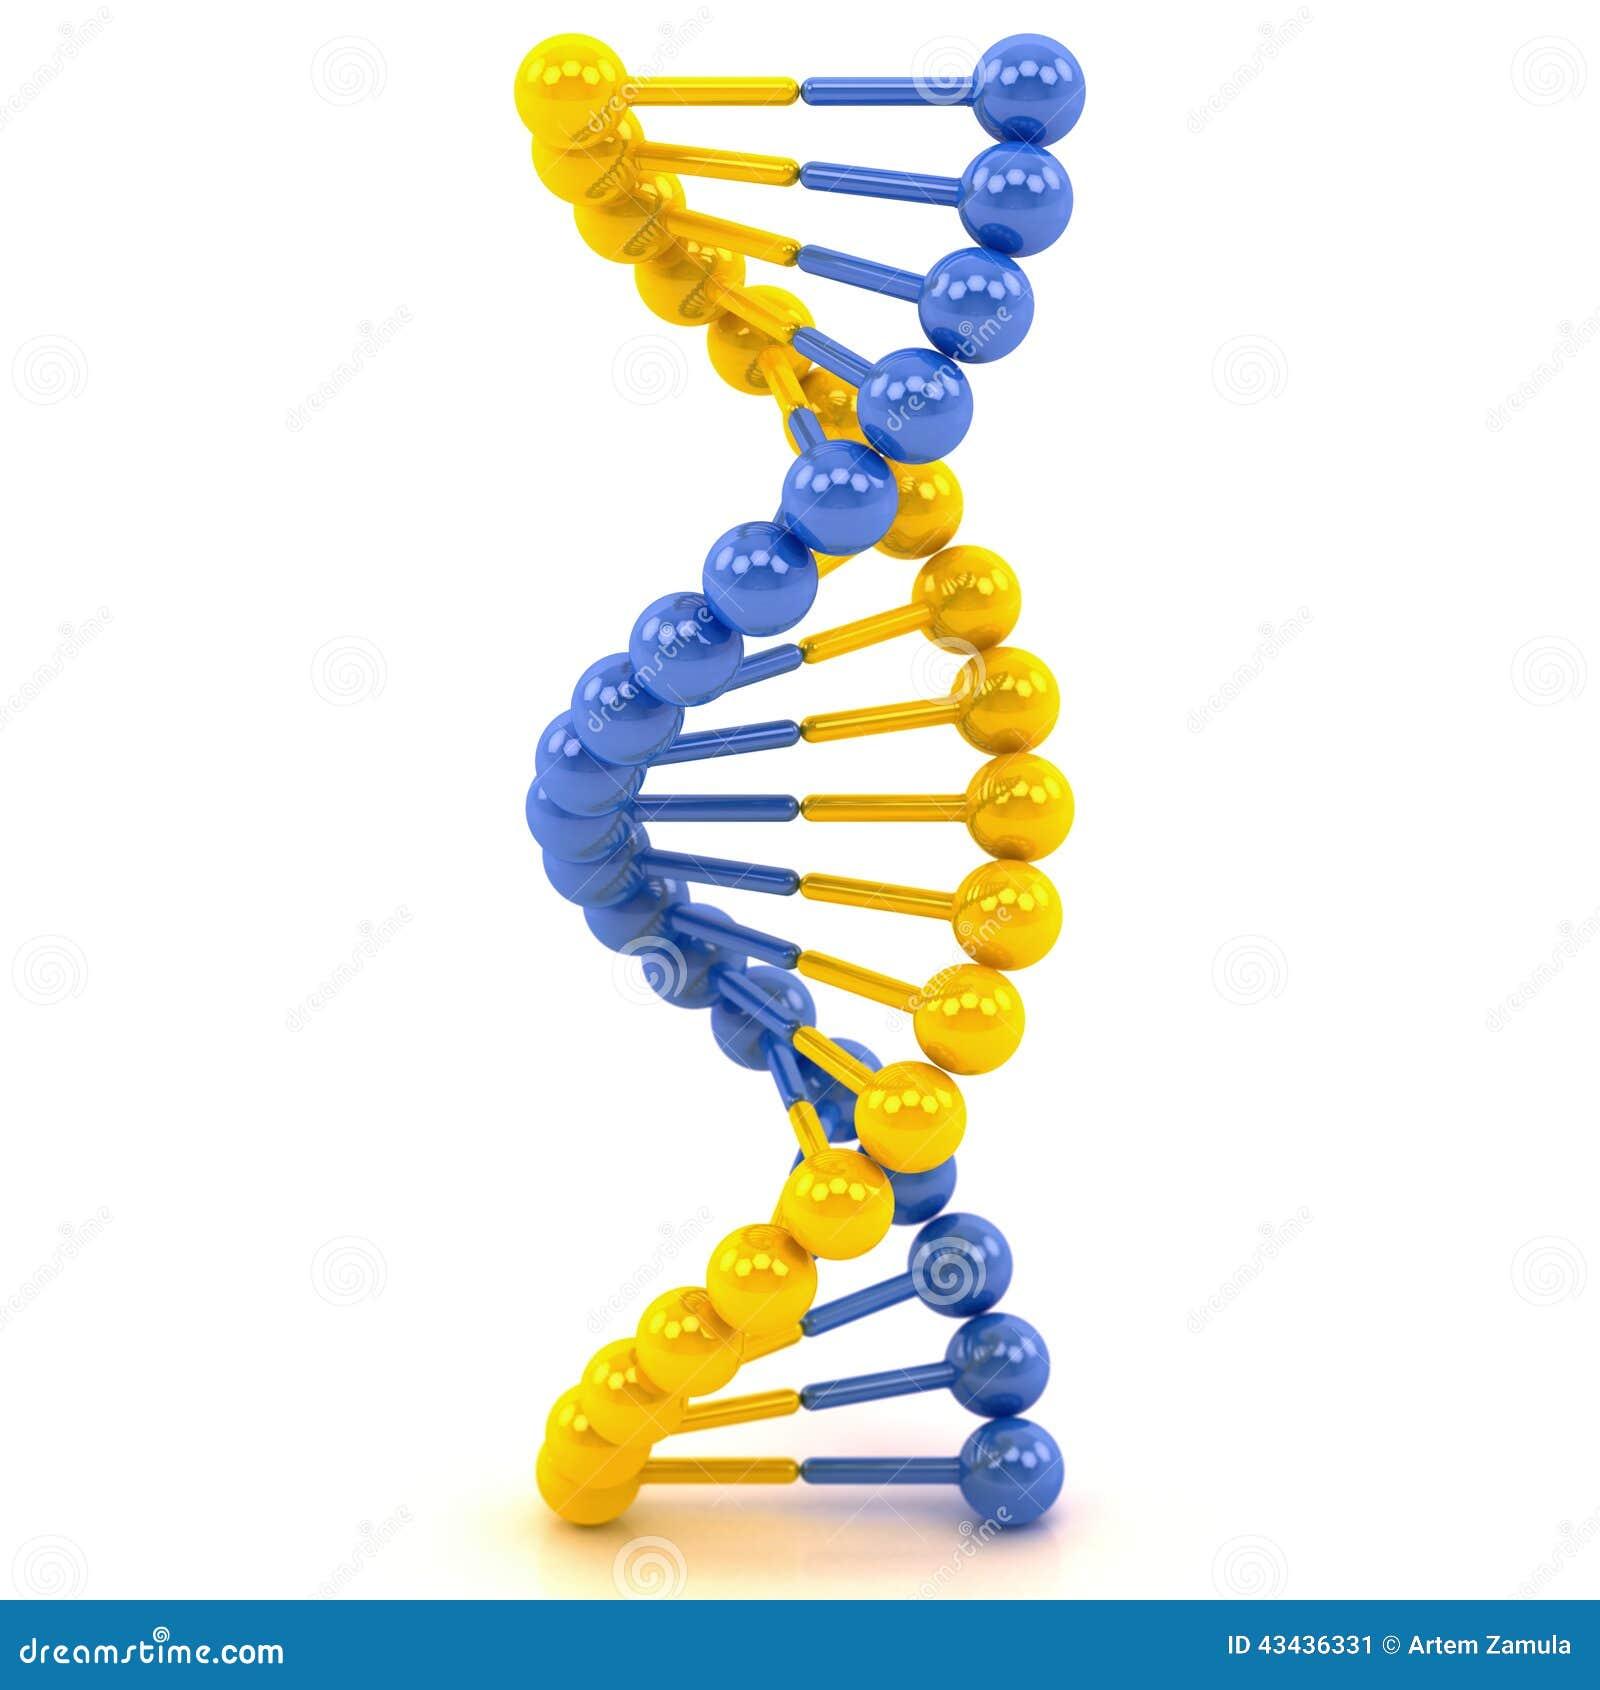 Dna Model Wallpaper: Yellow Blue DNA Molecule Stock Illustration. Image Of